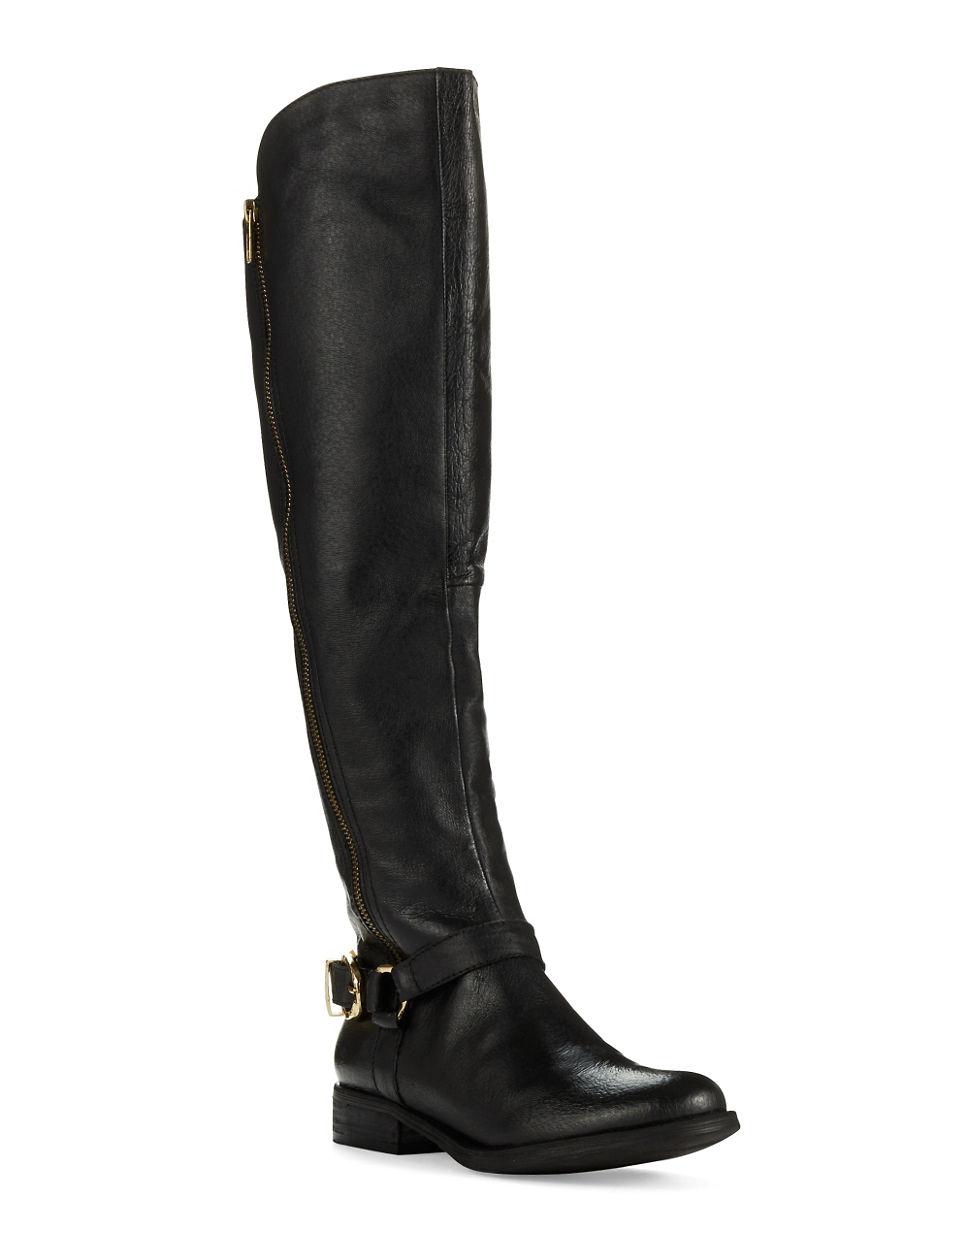 Steve Madden Black Riding Boots Www Imgkid Com The